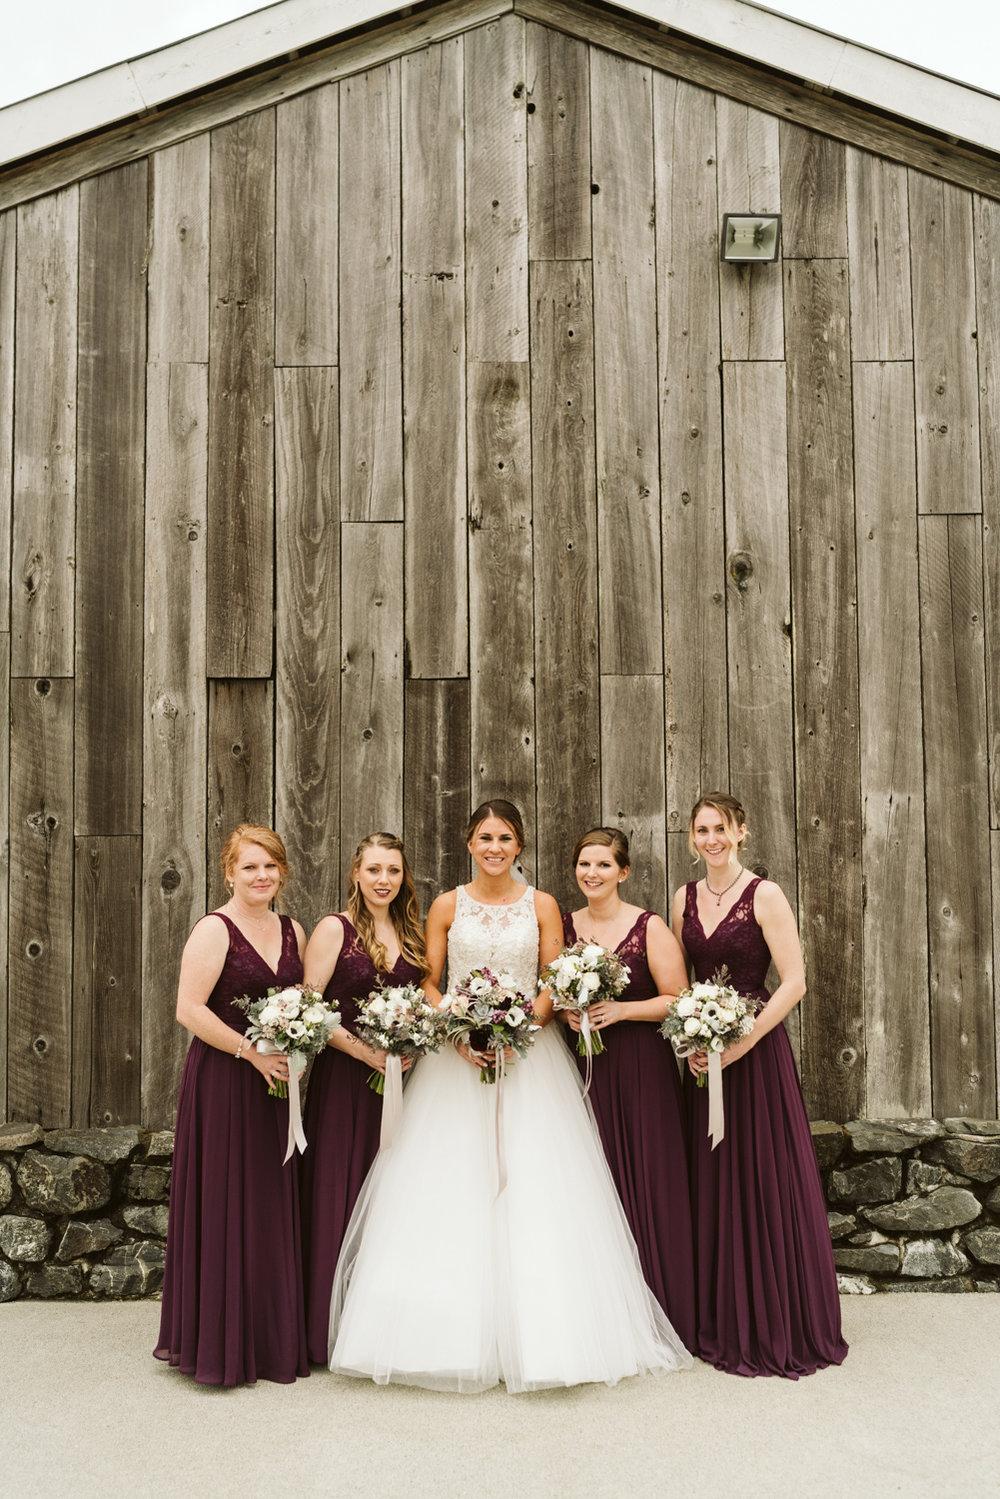 April Yentas Photography - jen and anthony wedding-27.jpg